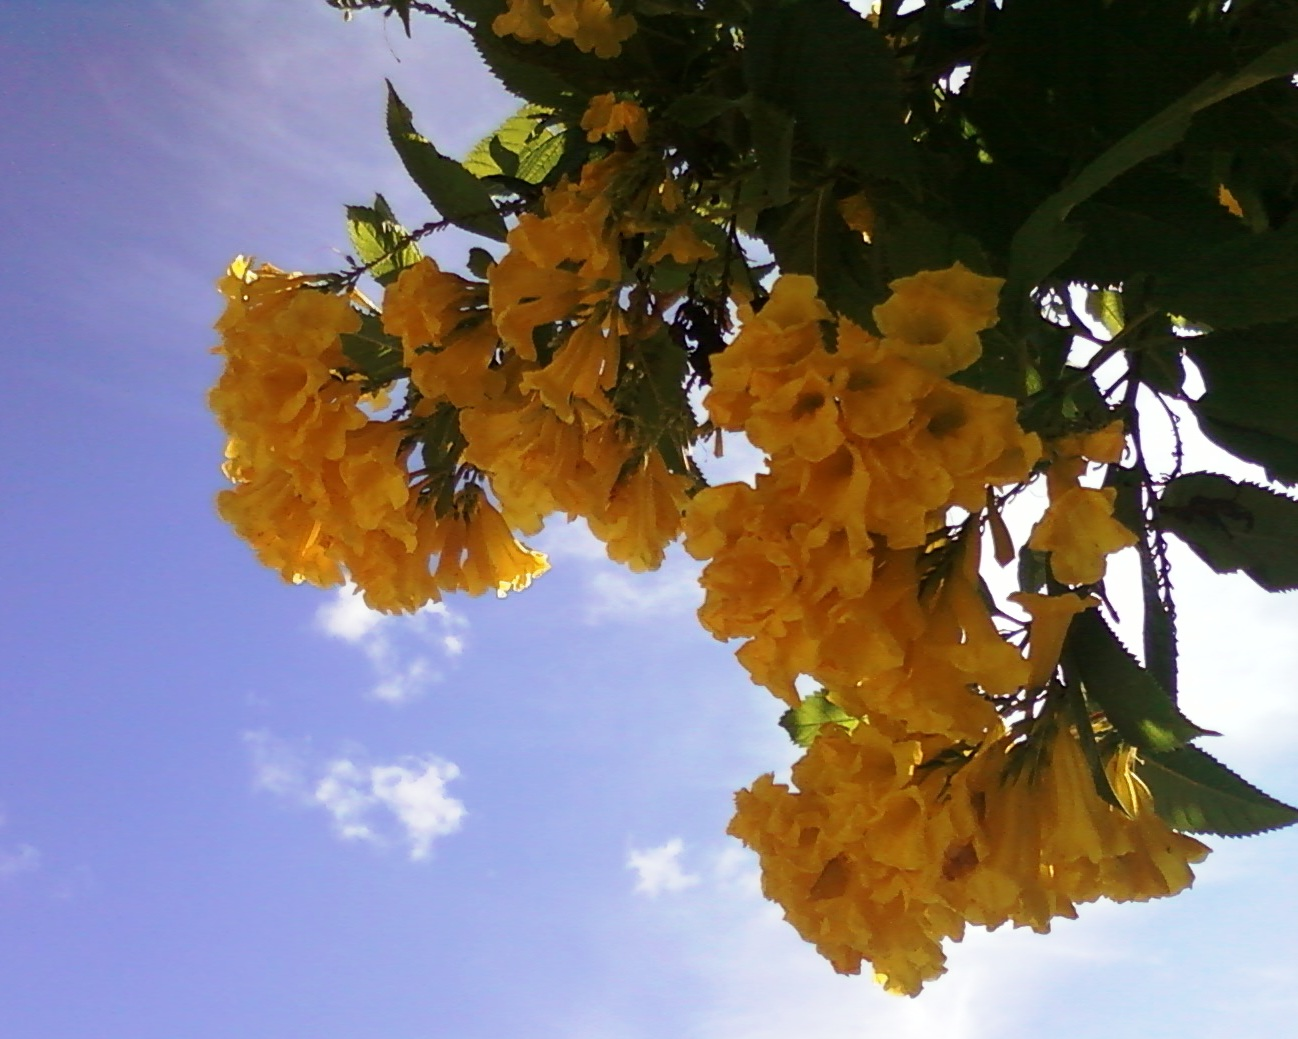 Filejacaranda Family Tecoma Stans Yellow Bell Flowers At Vuda Park